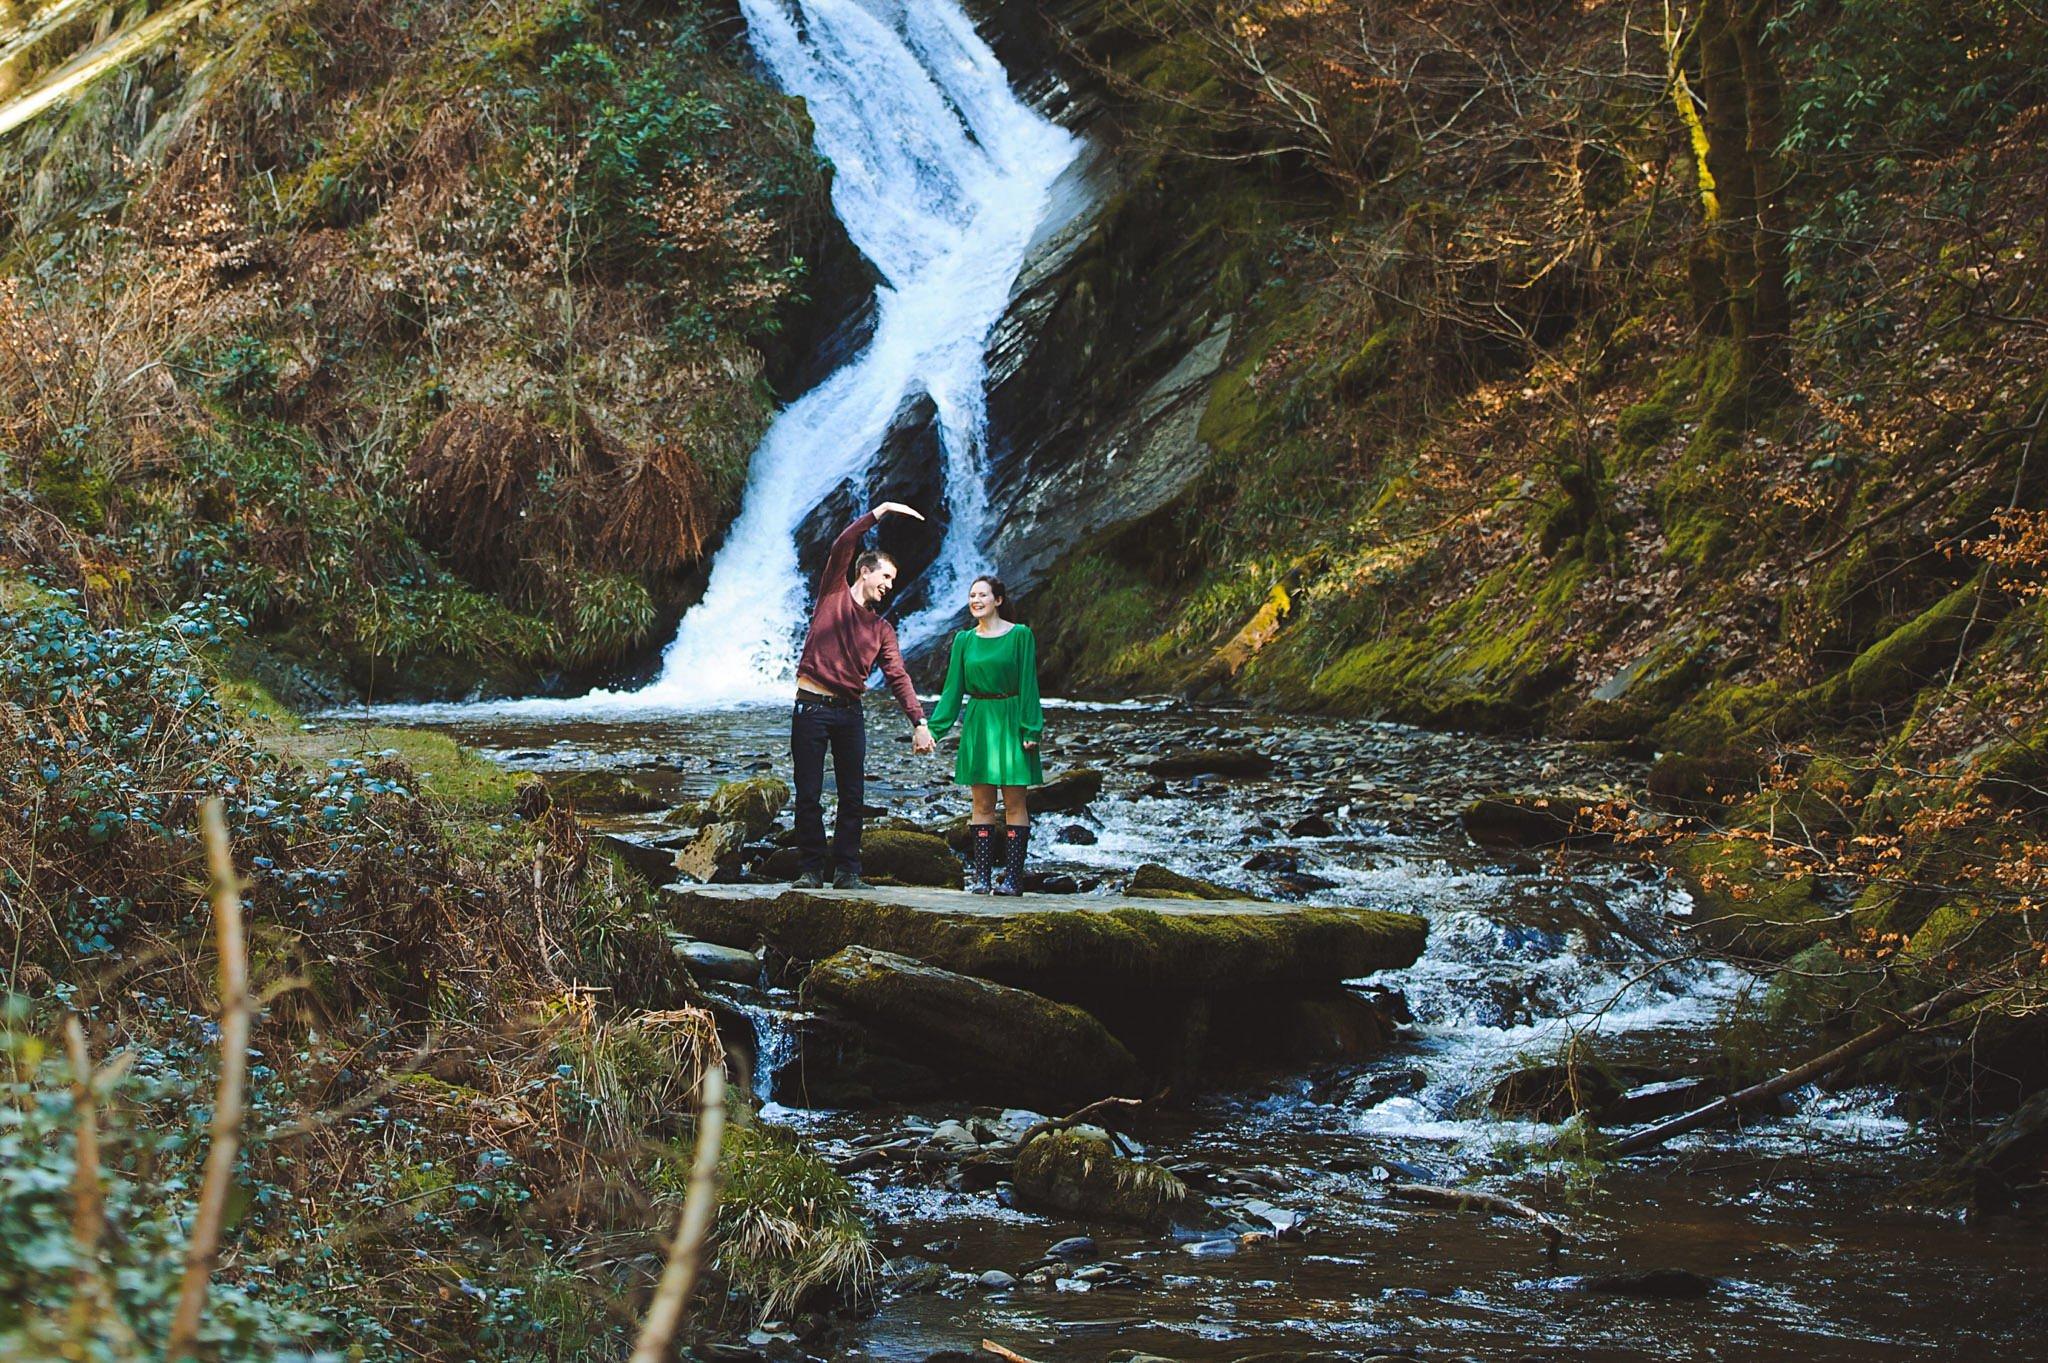 wedding-photographer-aberystwyth-wales (11)